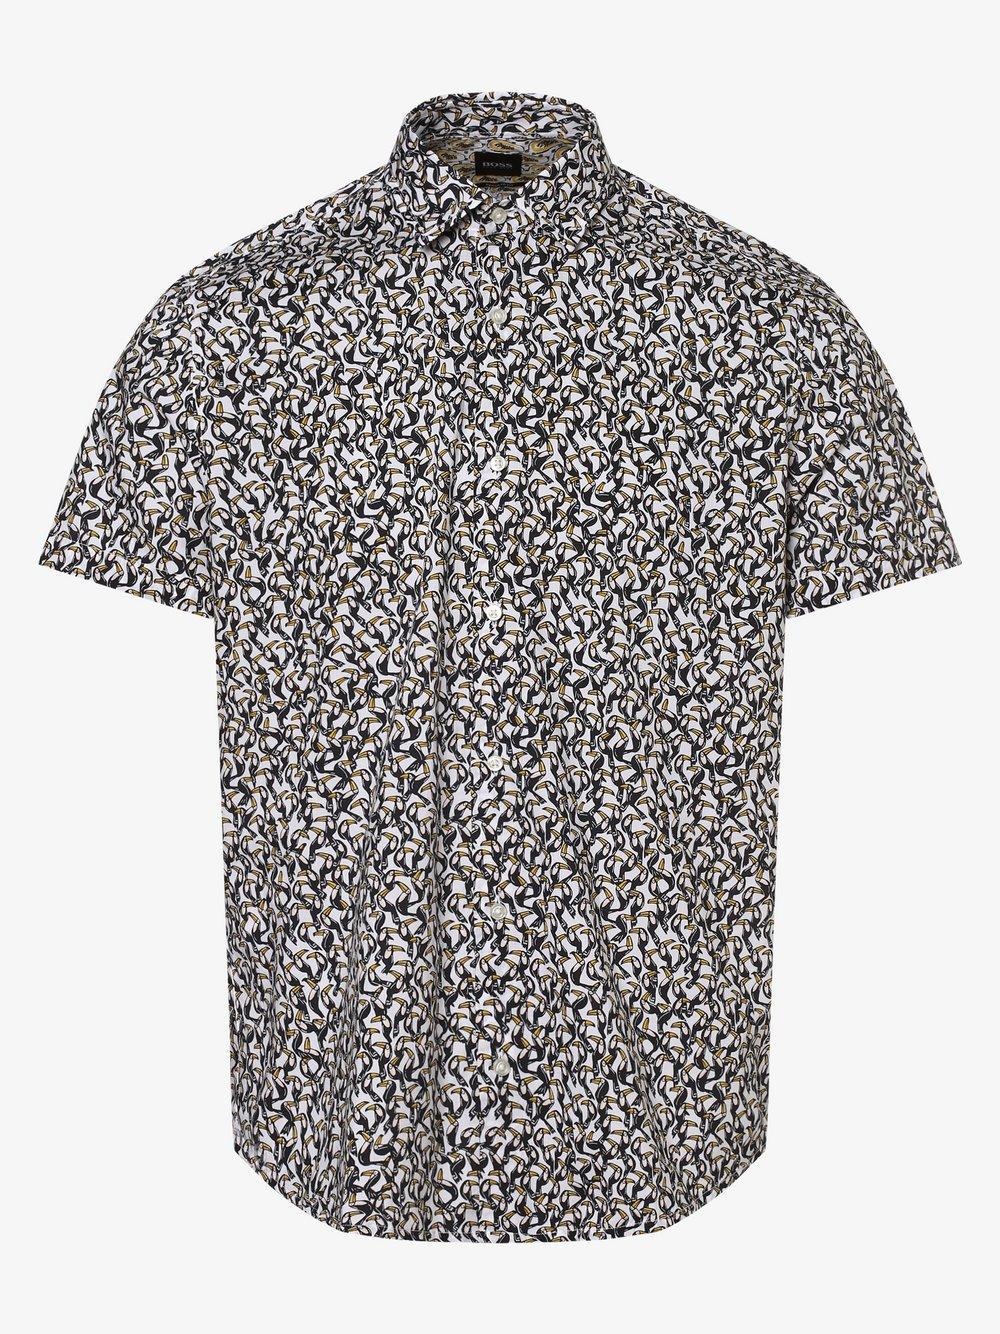 BOSS Casual – Koszula męska – Rash, biały Van Graaf 460309-0001